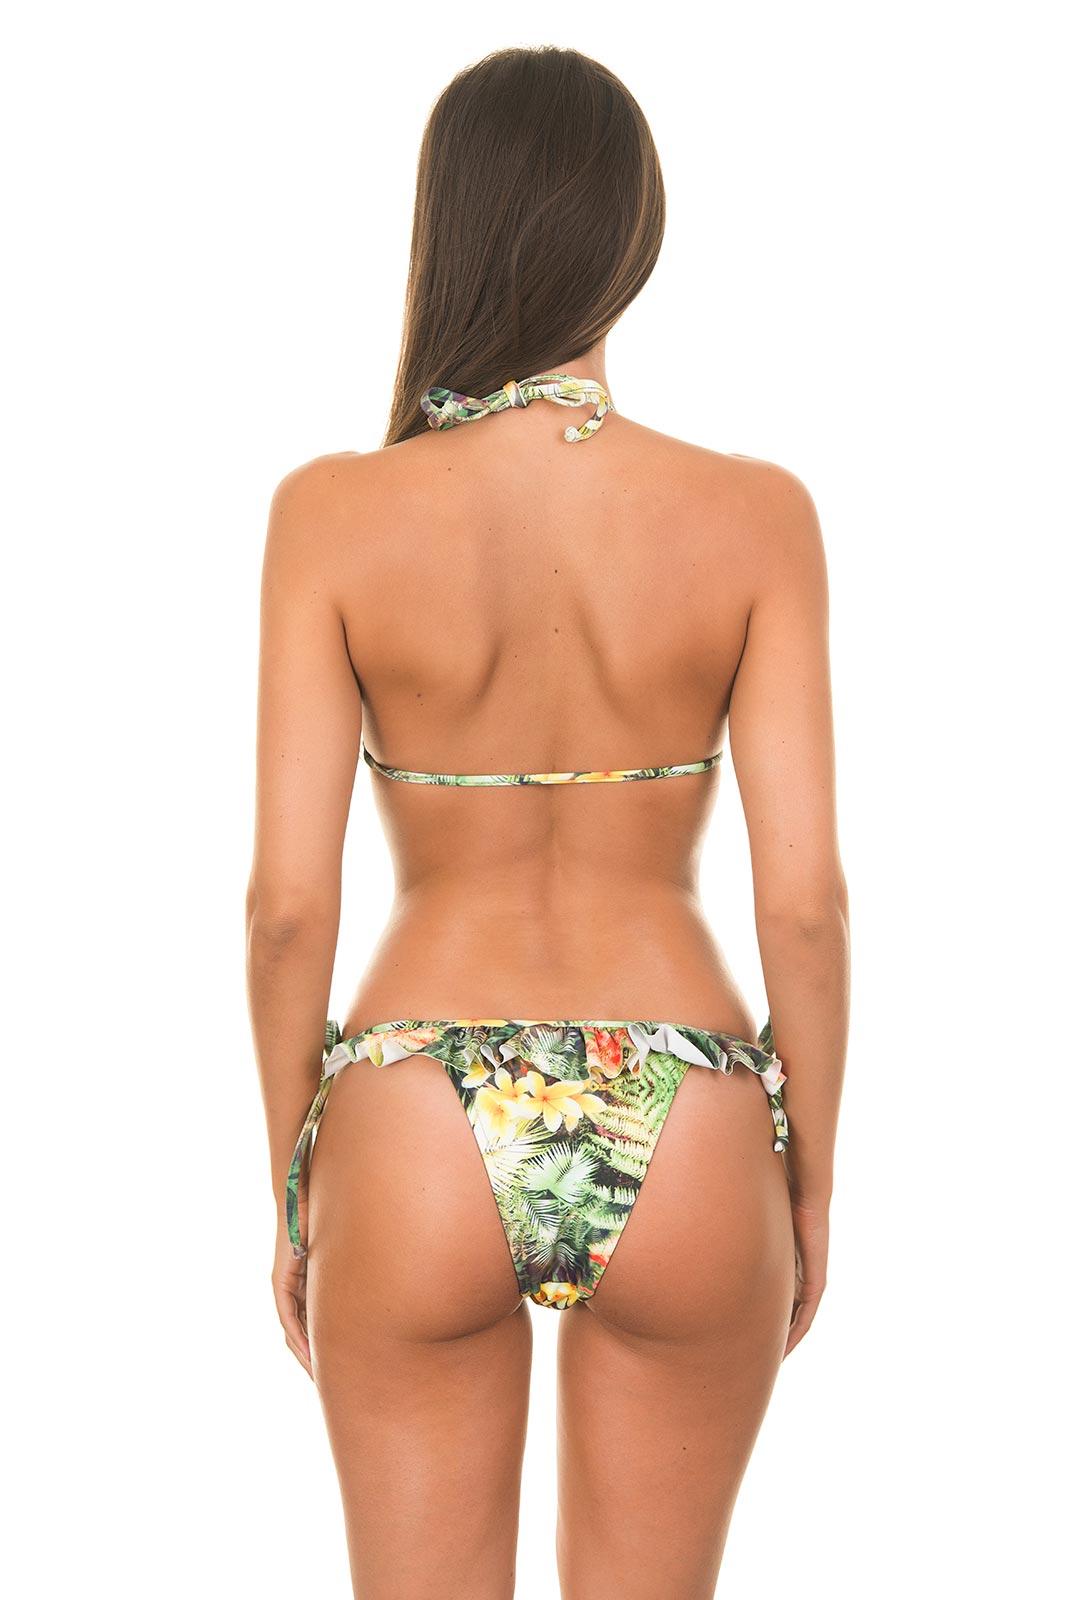 maryssil r schen bikini mit tropenwald print xaxim. Black Bedroom Furniture Sets. Home Design Ideas